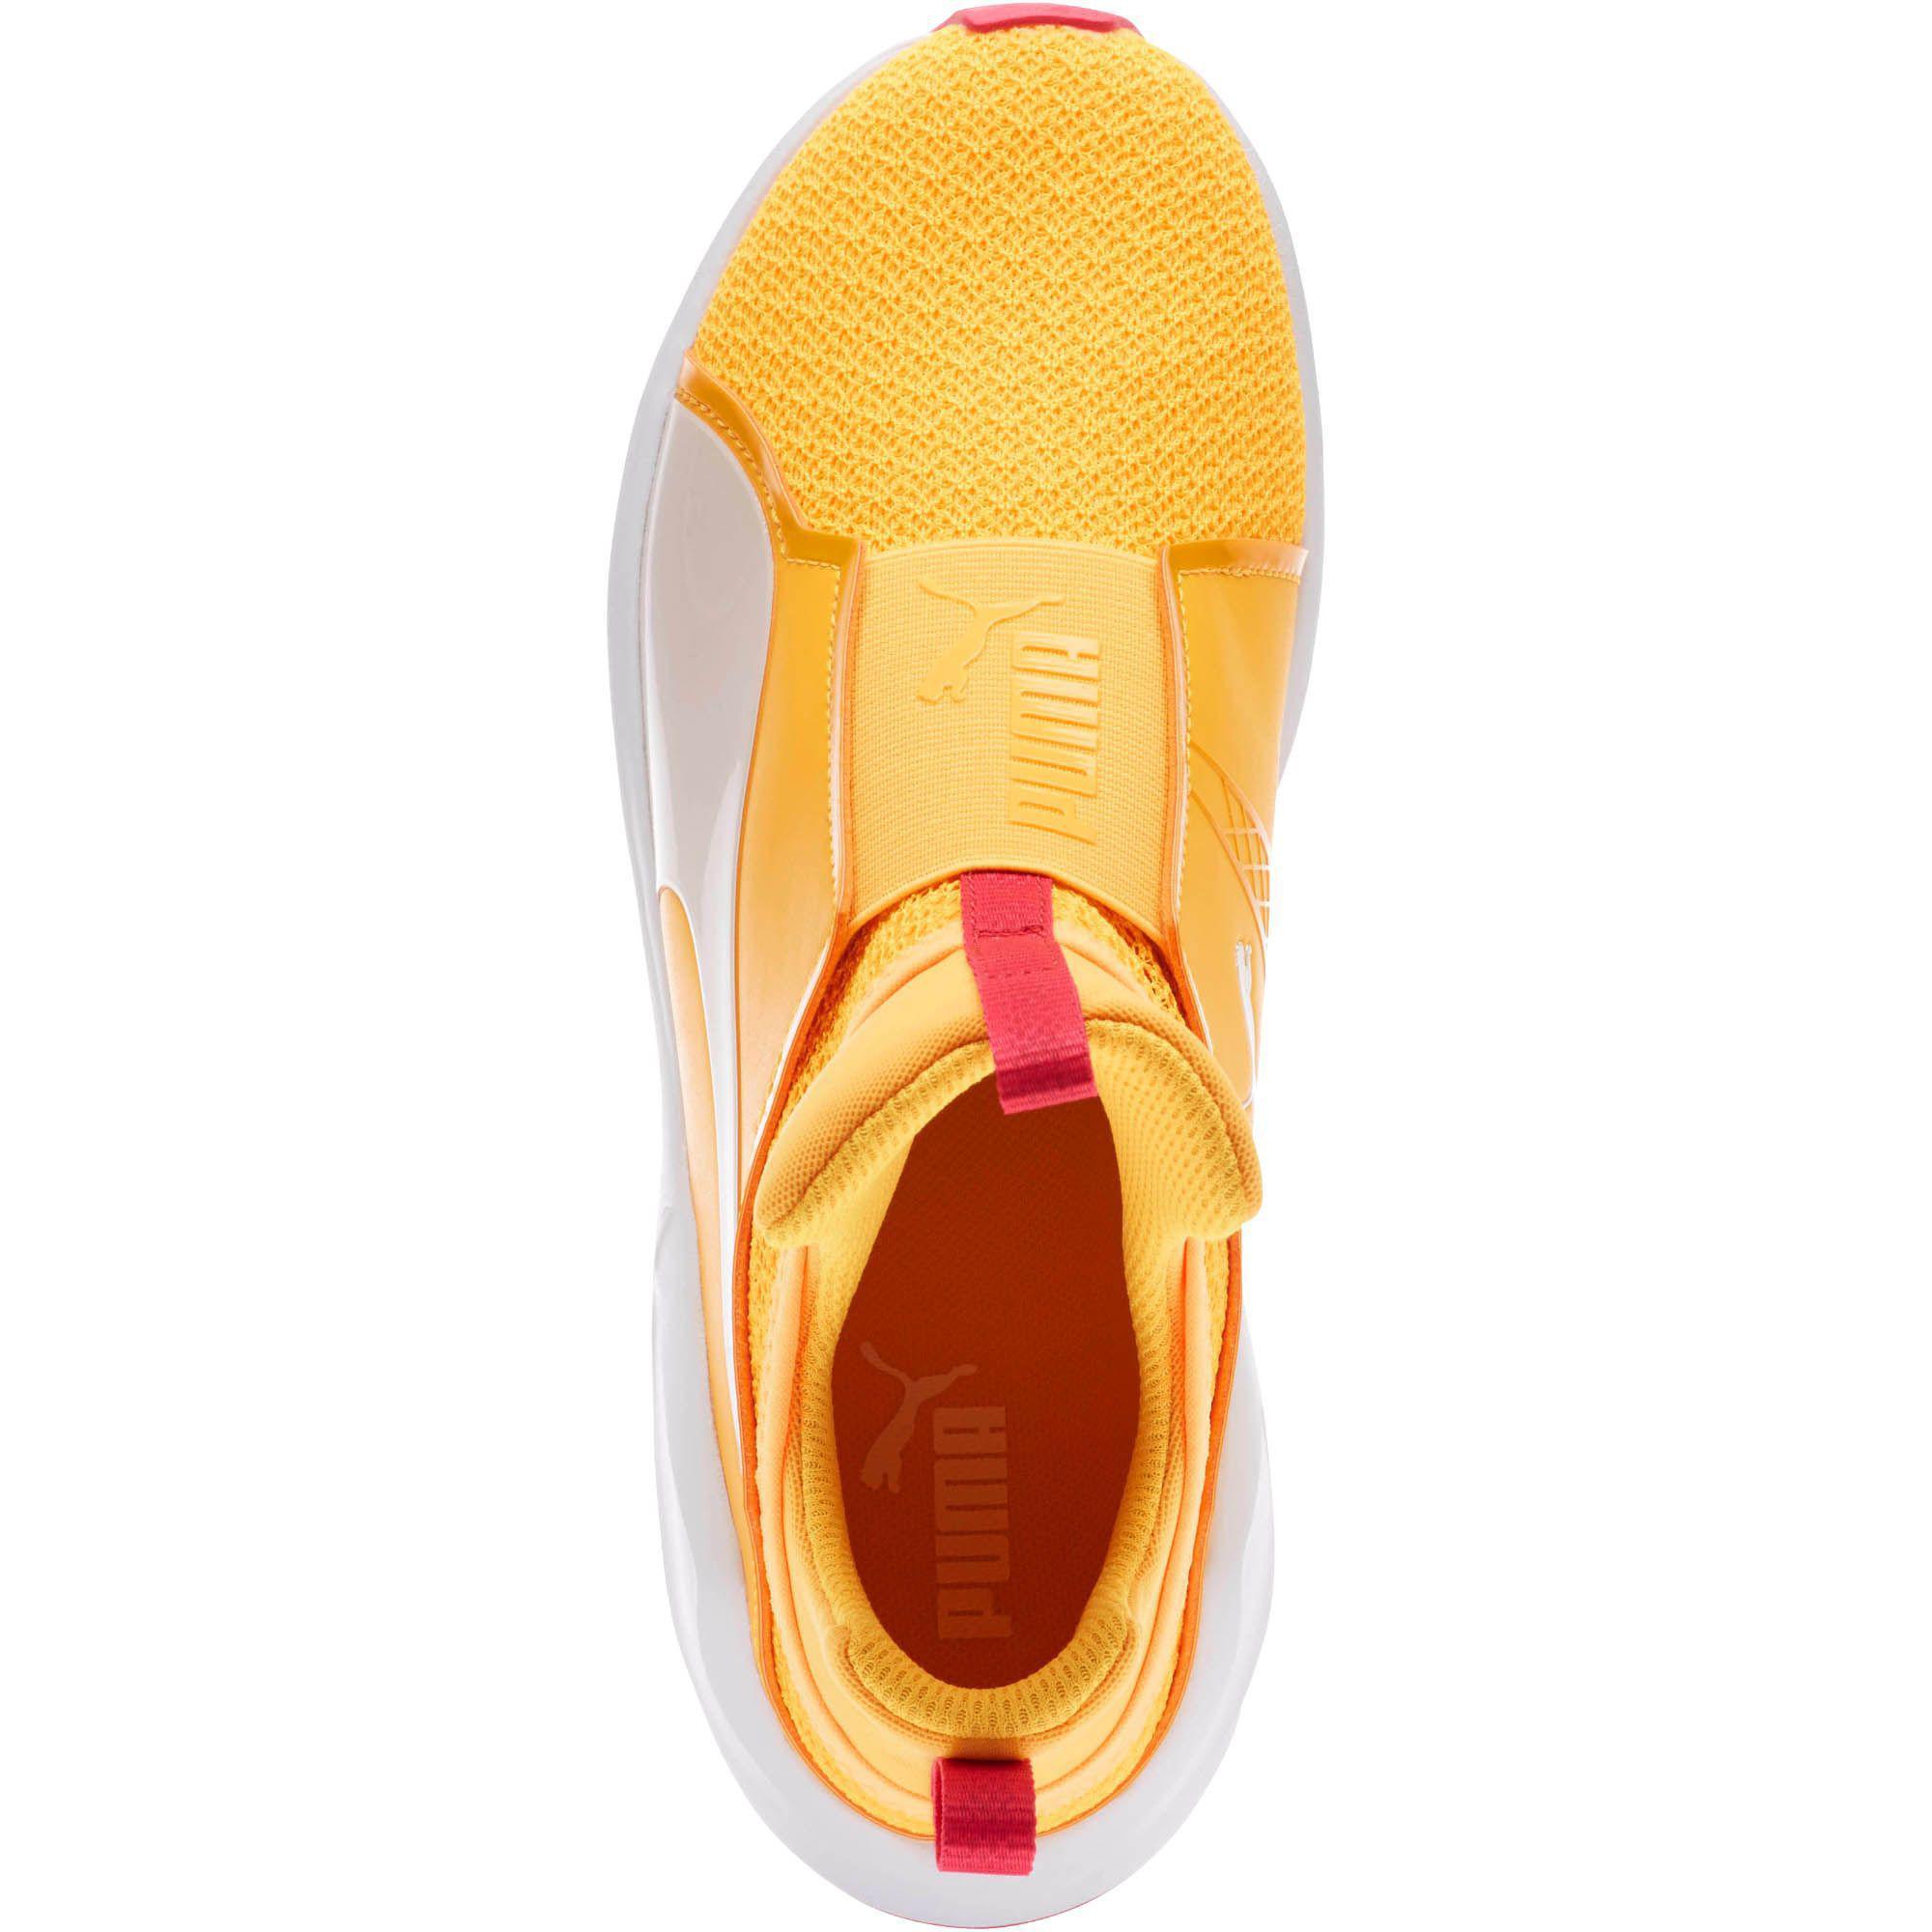 Lyst - PUMA Fierce Culture Surf Women s Training Shoes 72378a92c